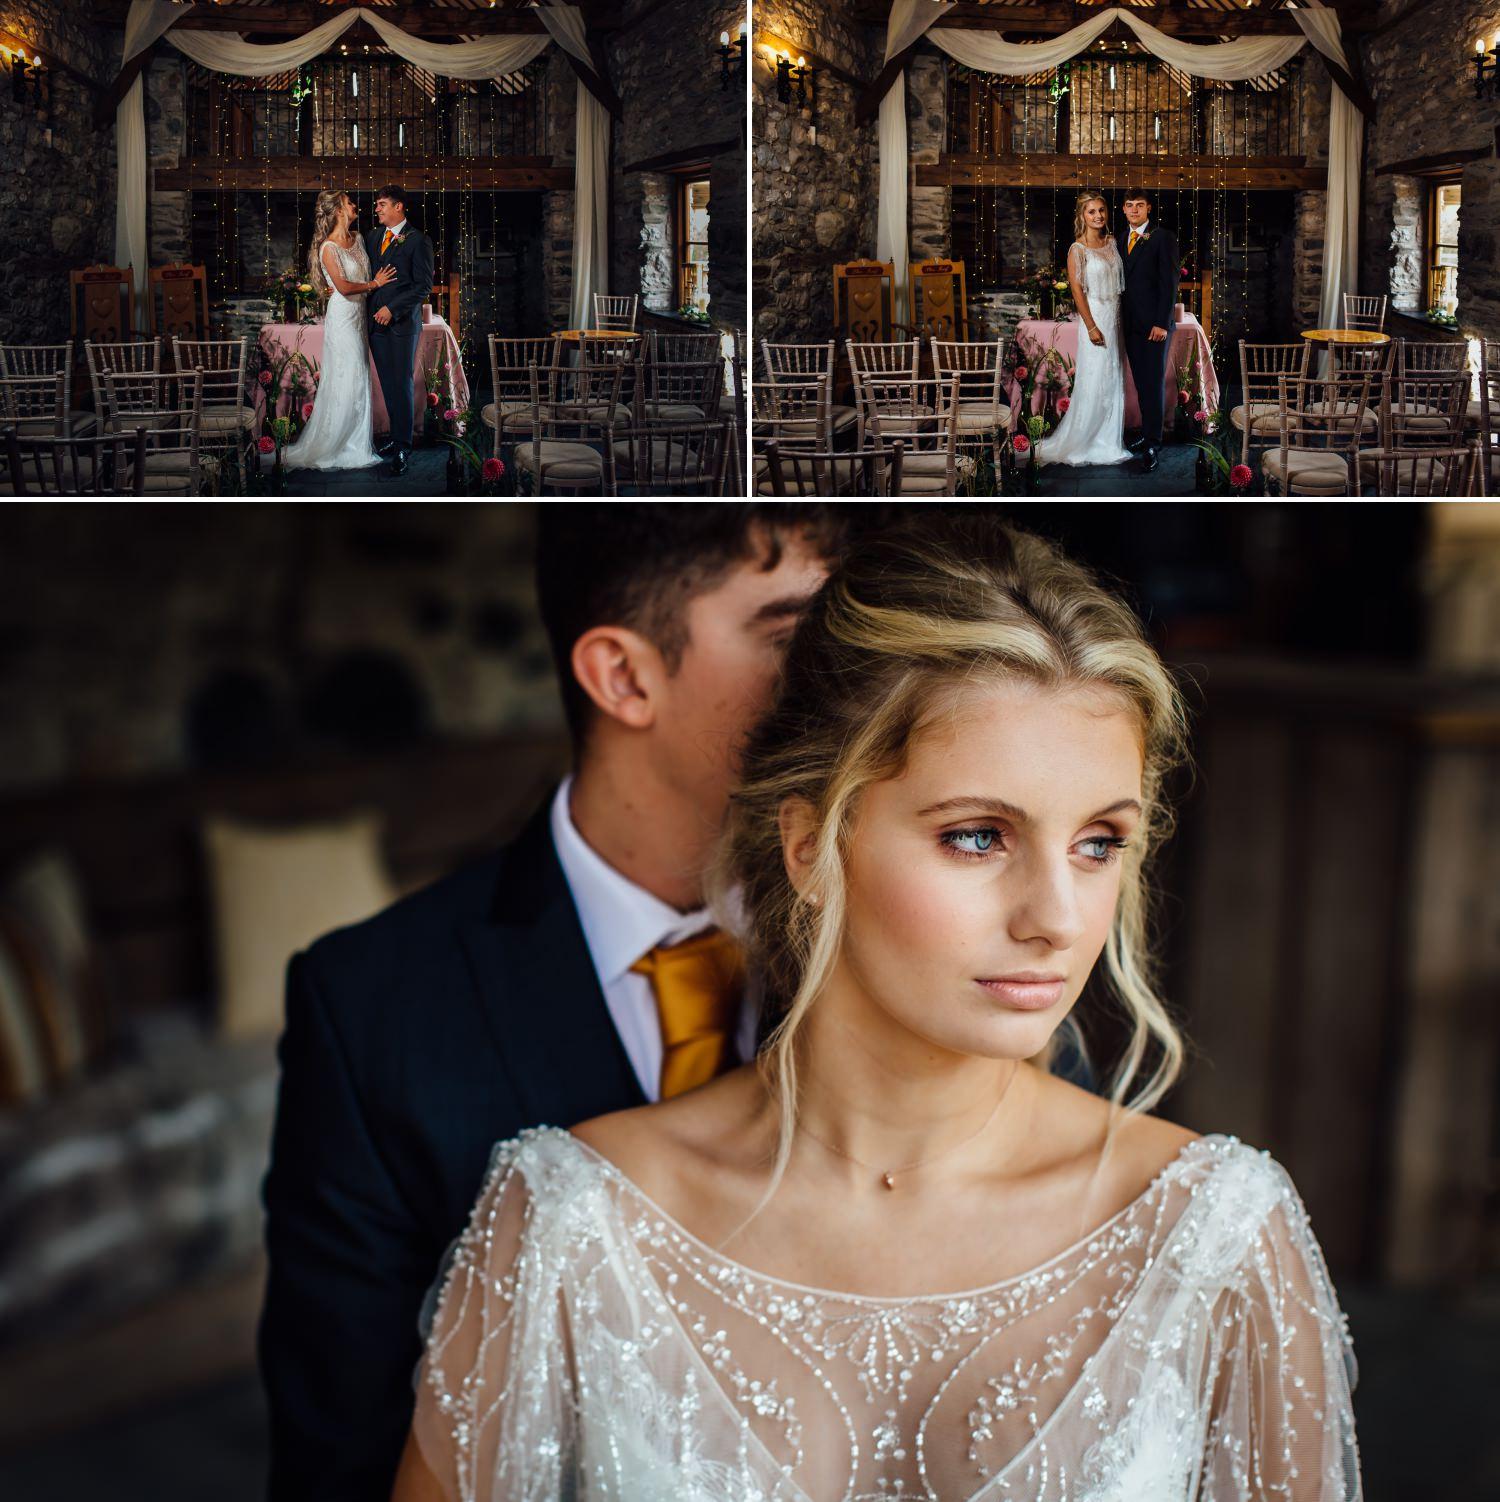 Wedding photography in North Wales Wedding Barn Plas Isaf